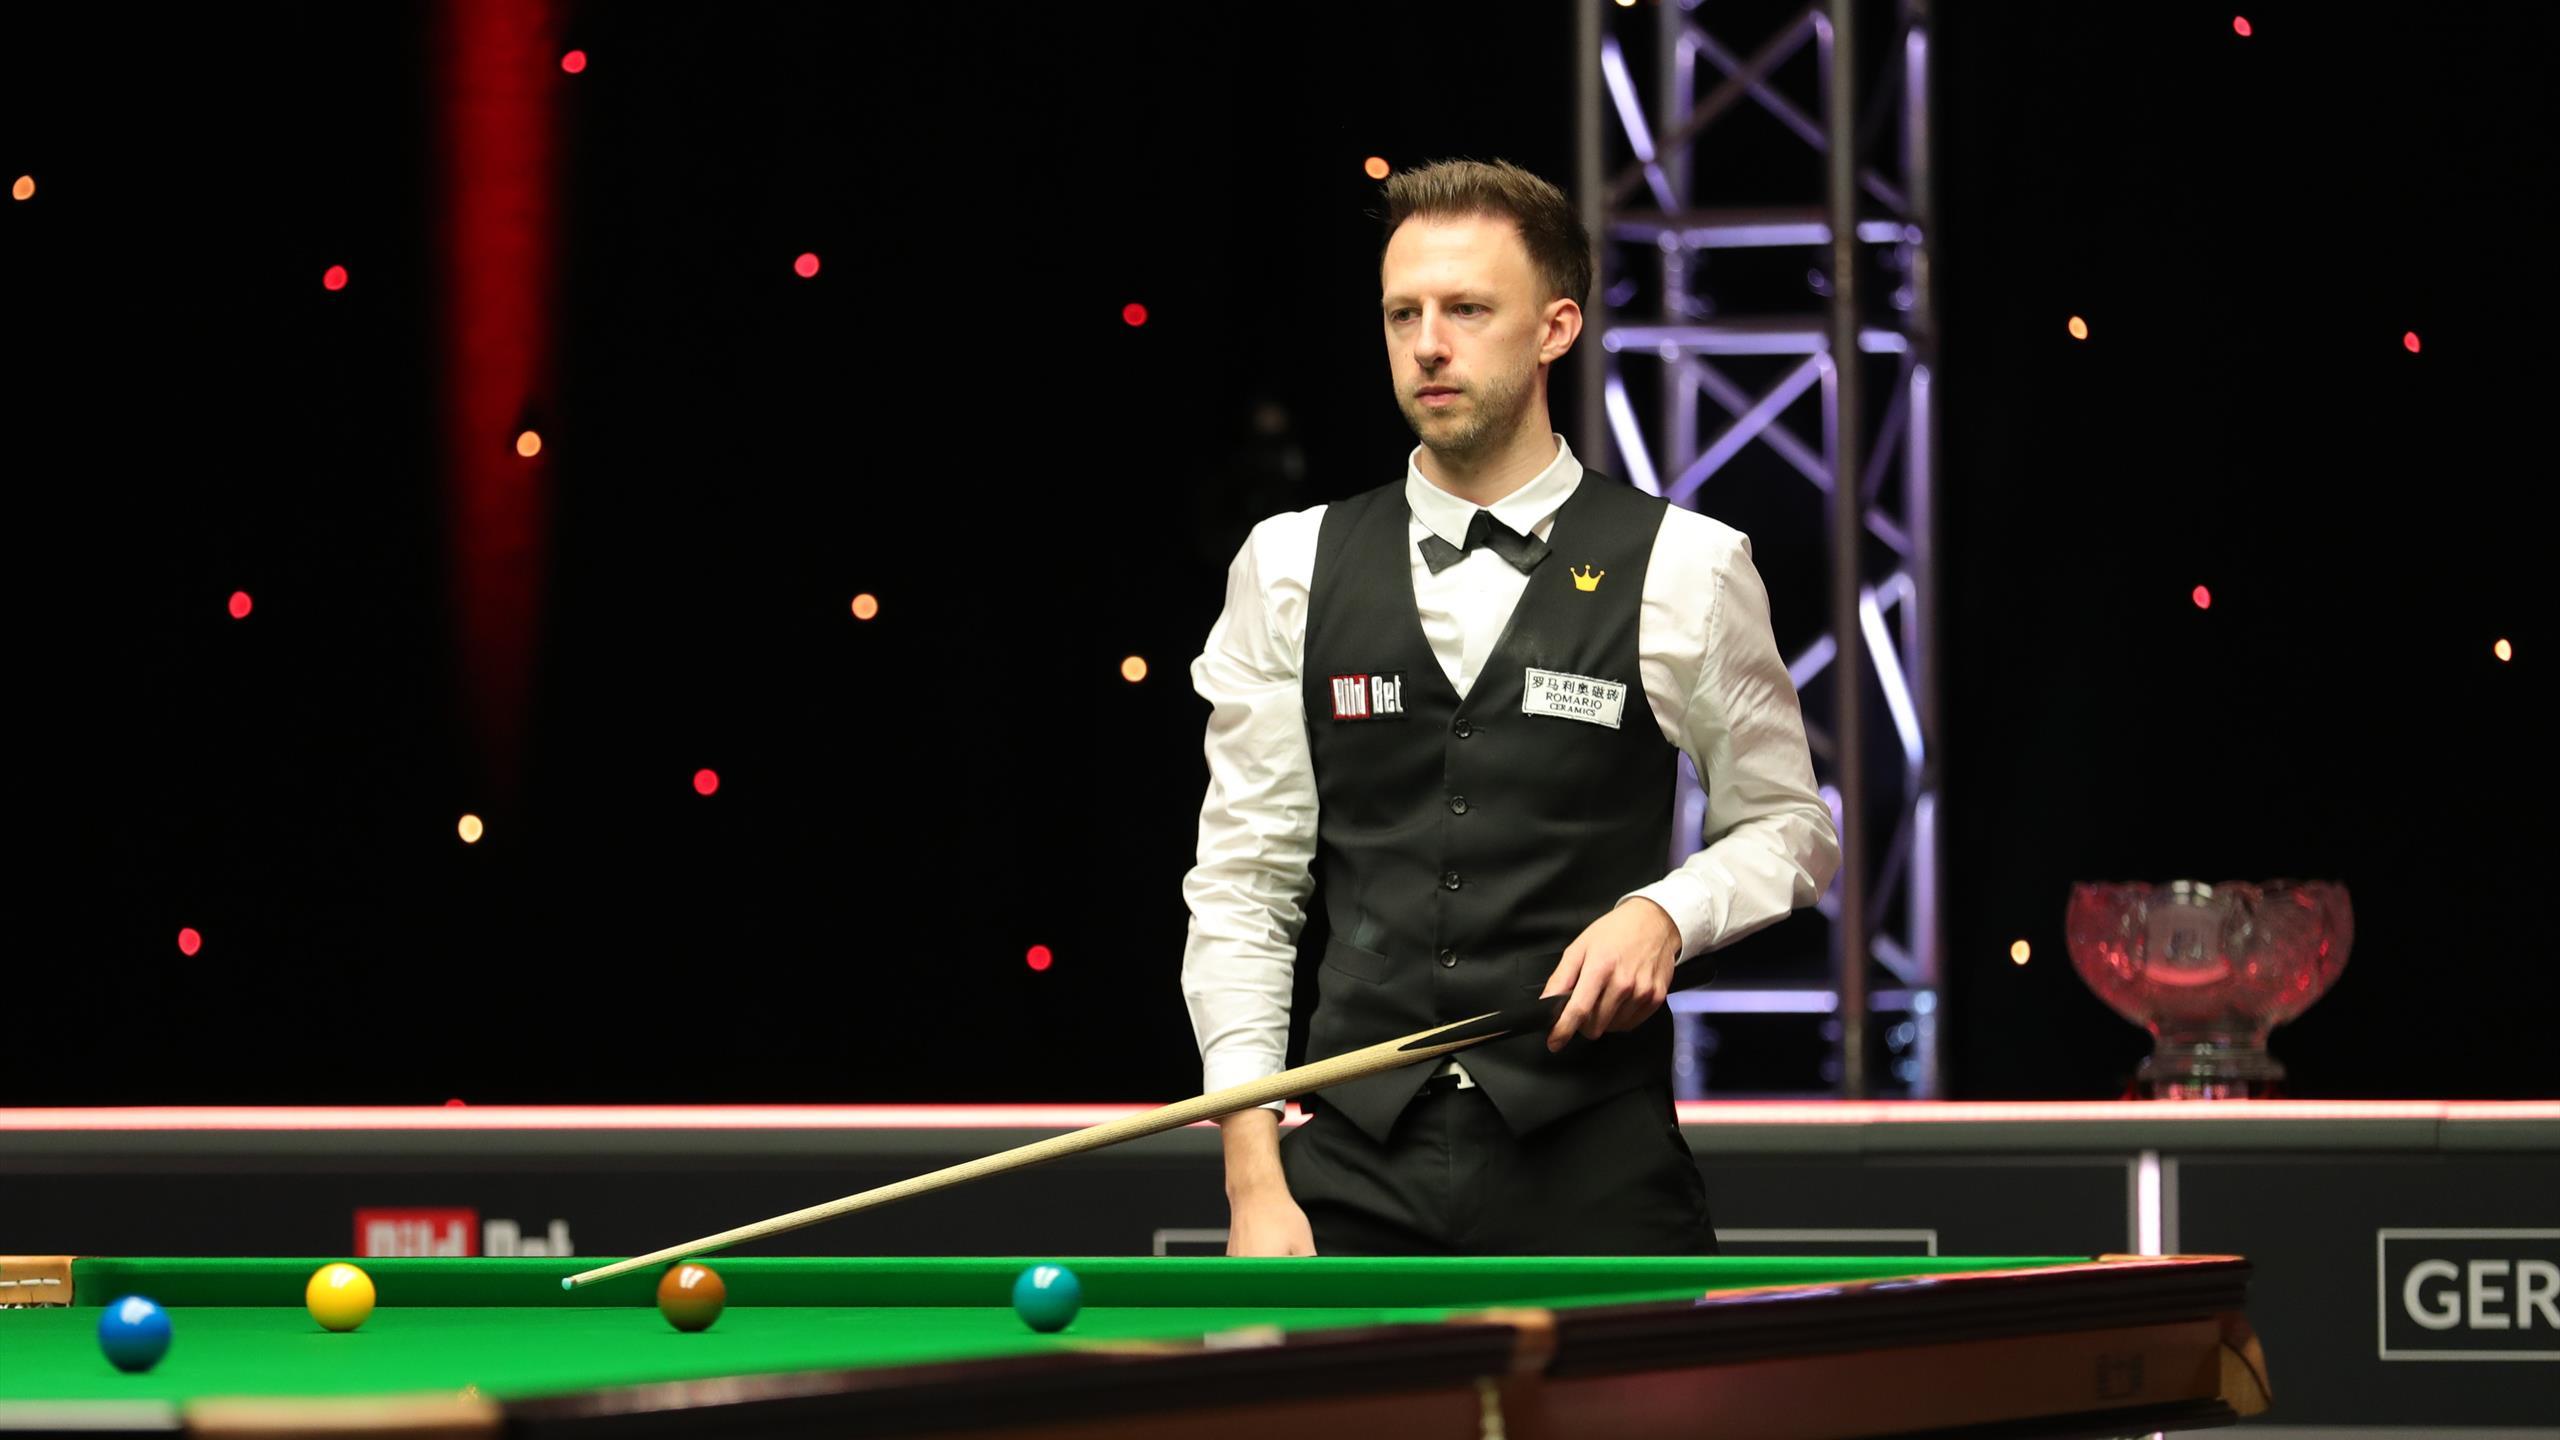 German Masters Snooker 2021 As It Happened Defending Champion Judd Trump Beats Jack Lisowski Eurosport